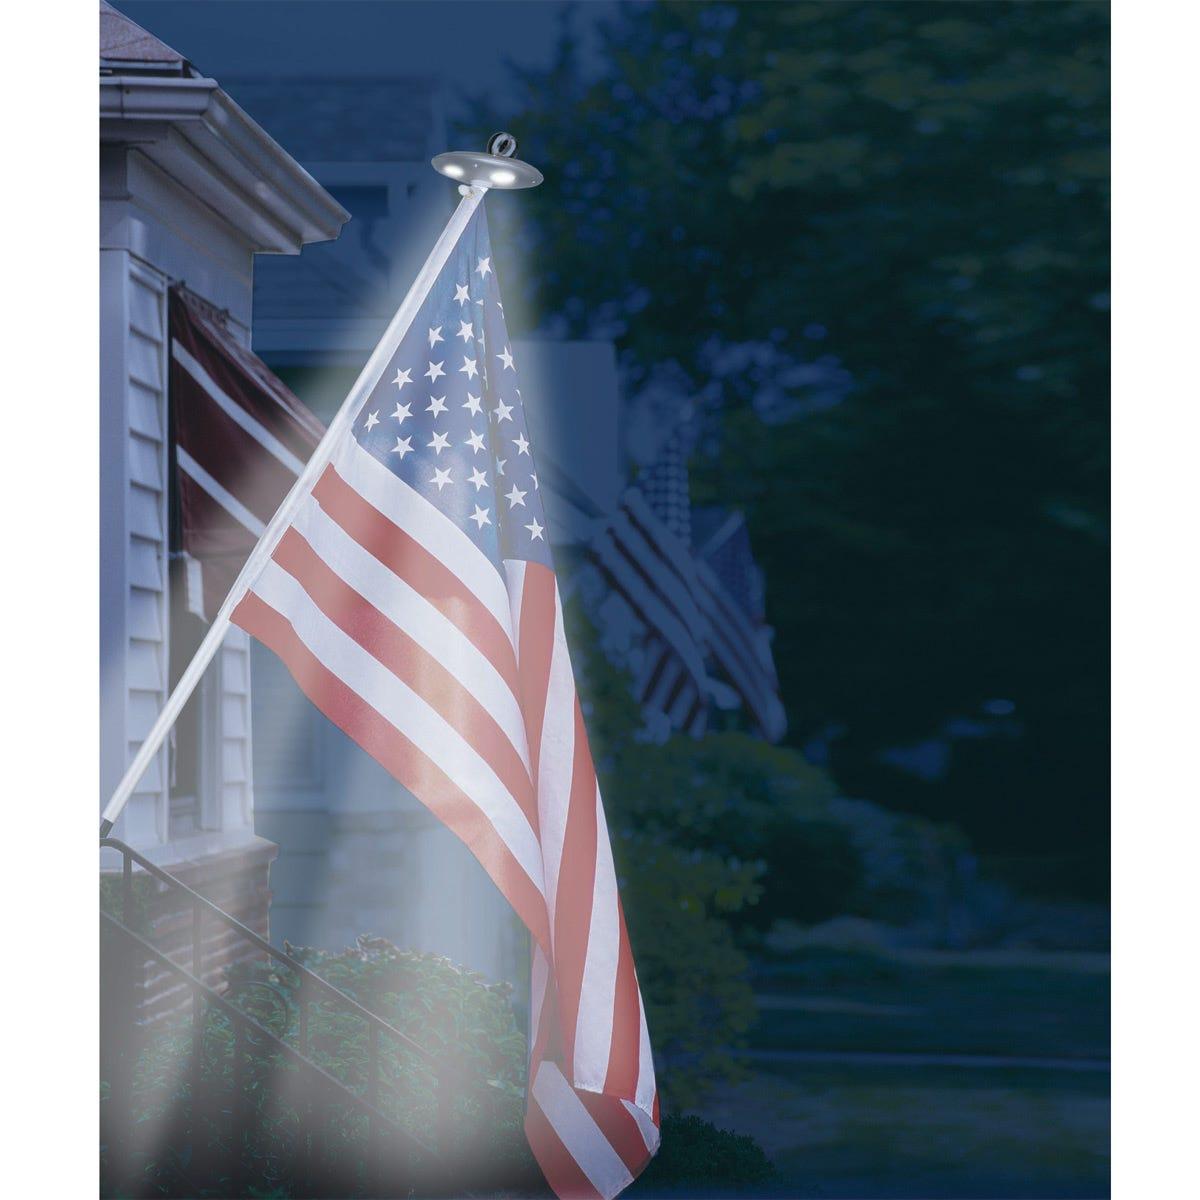 Solar Residential Flagpole Light From Sportys Preferred